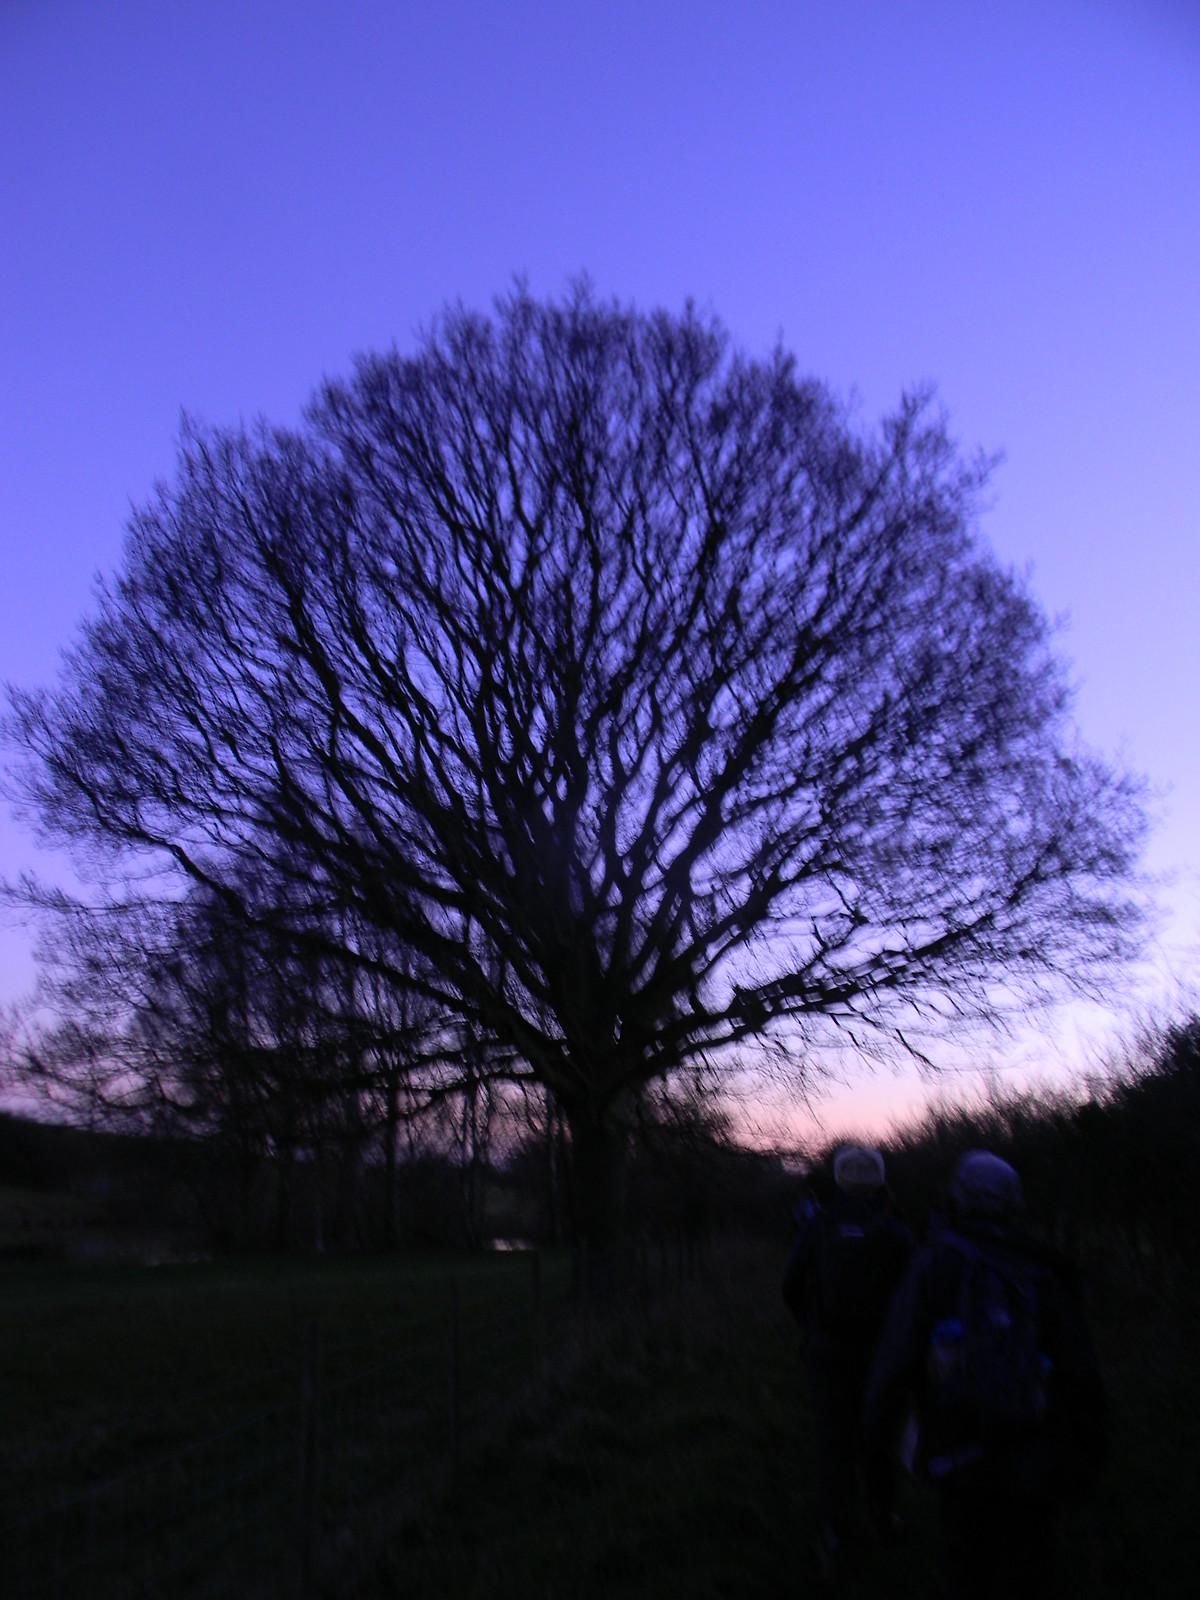 Tree at dusk 1 Appledore Short Circular